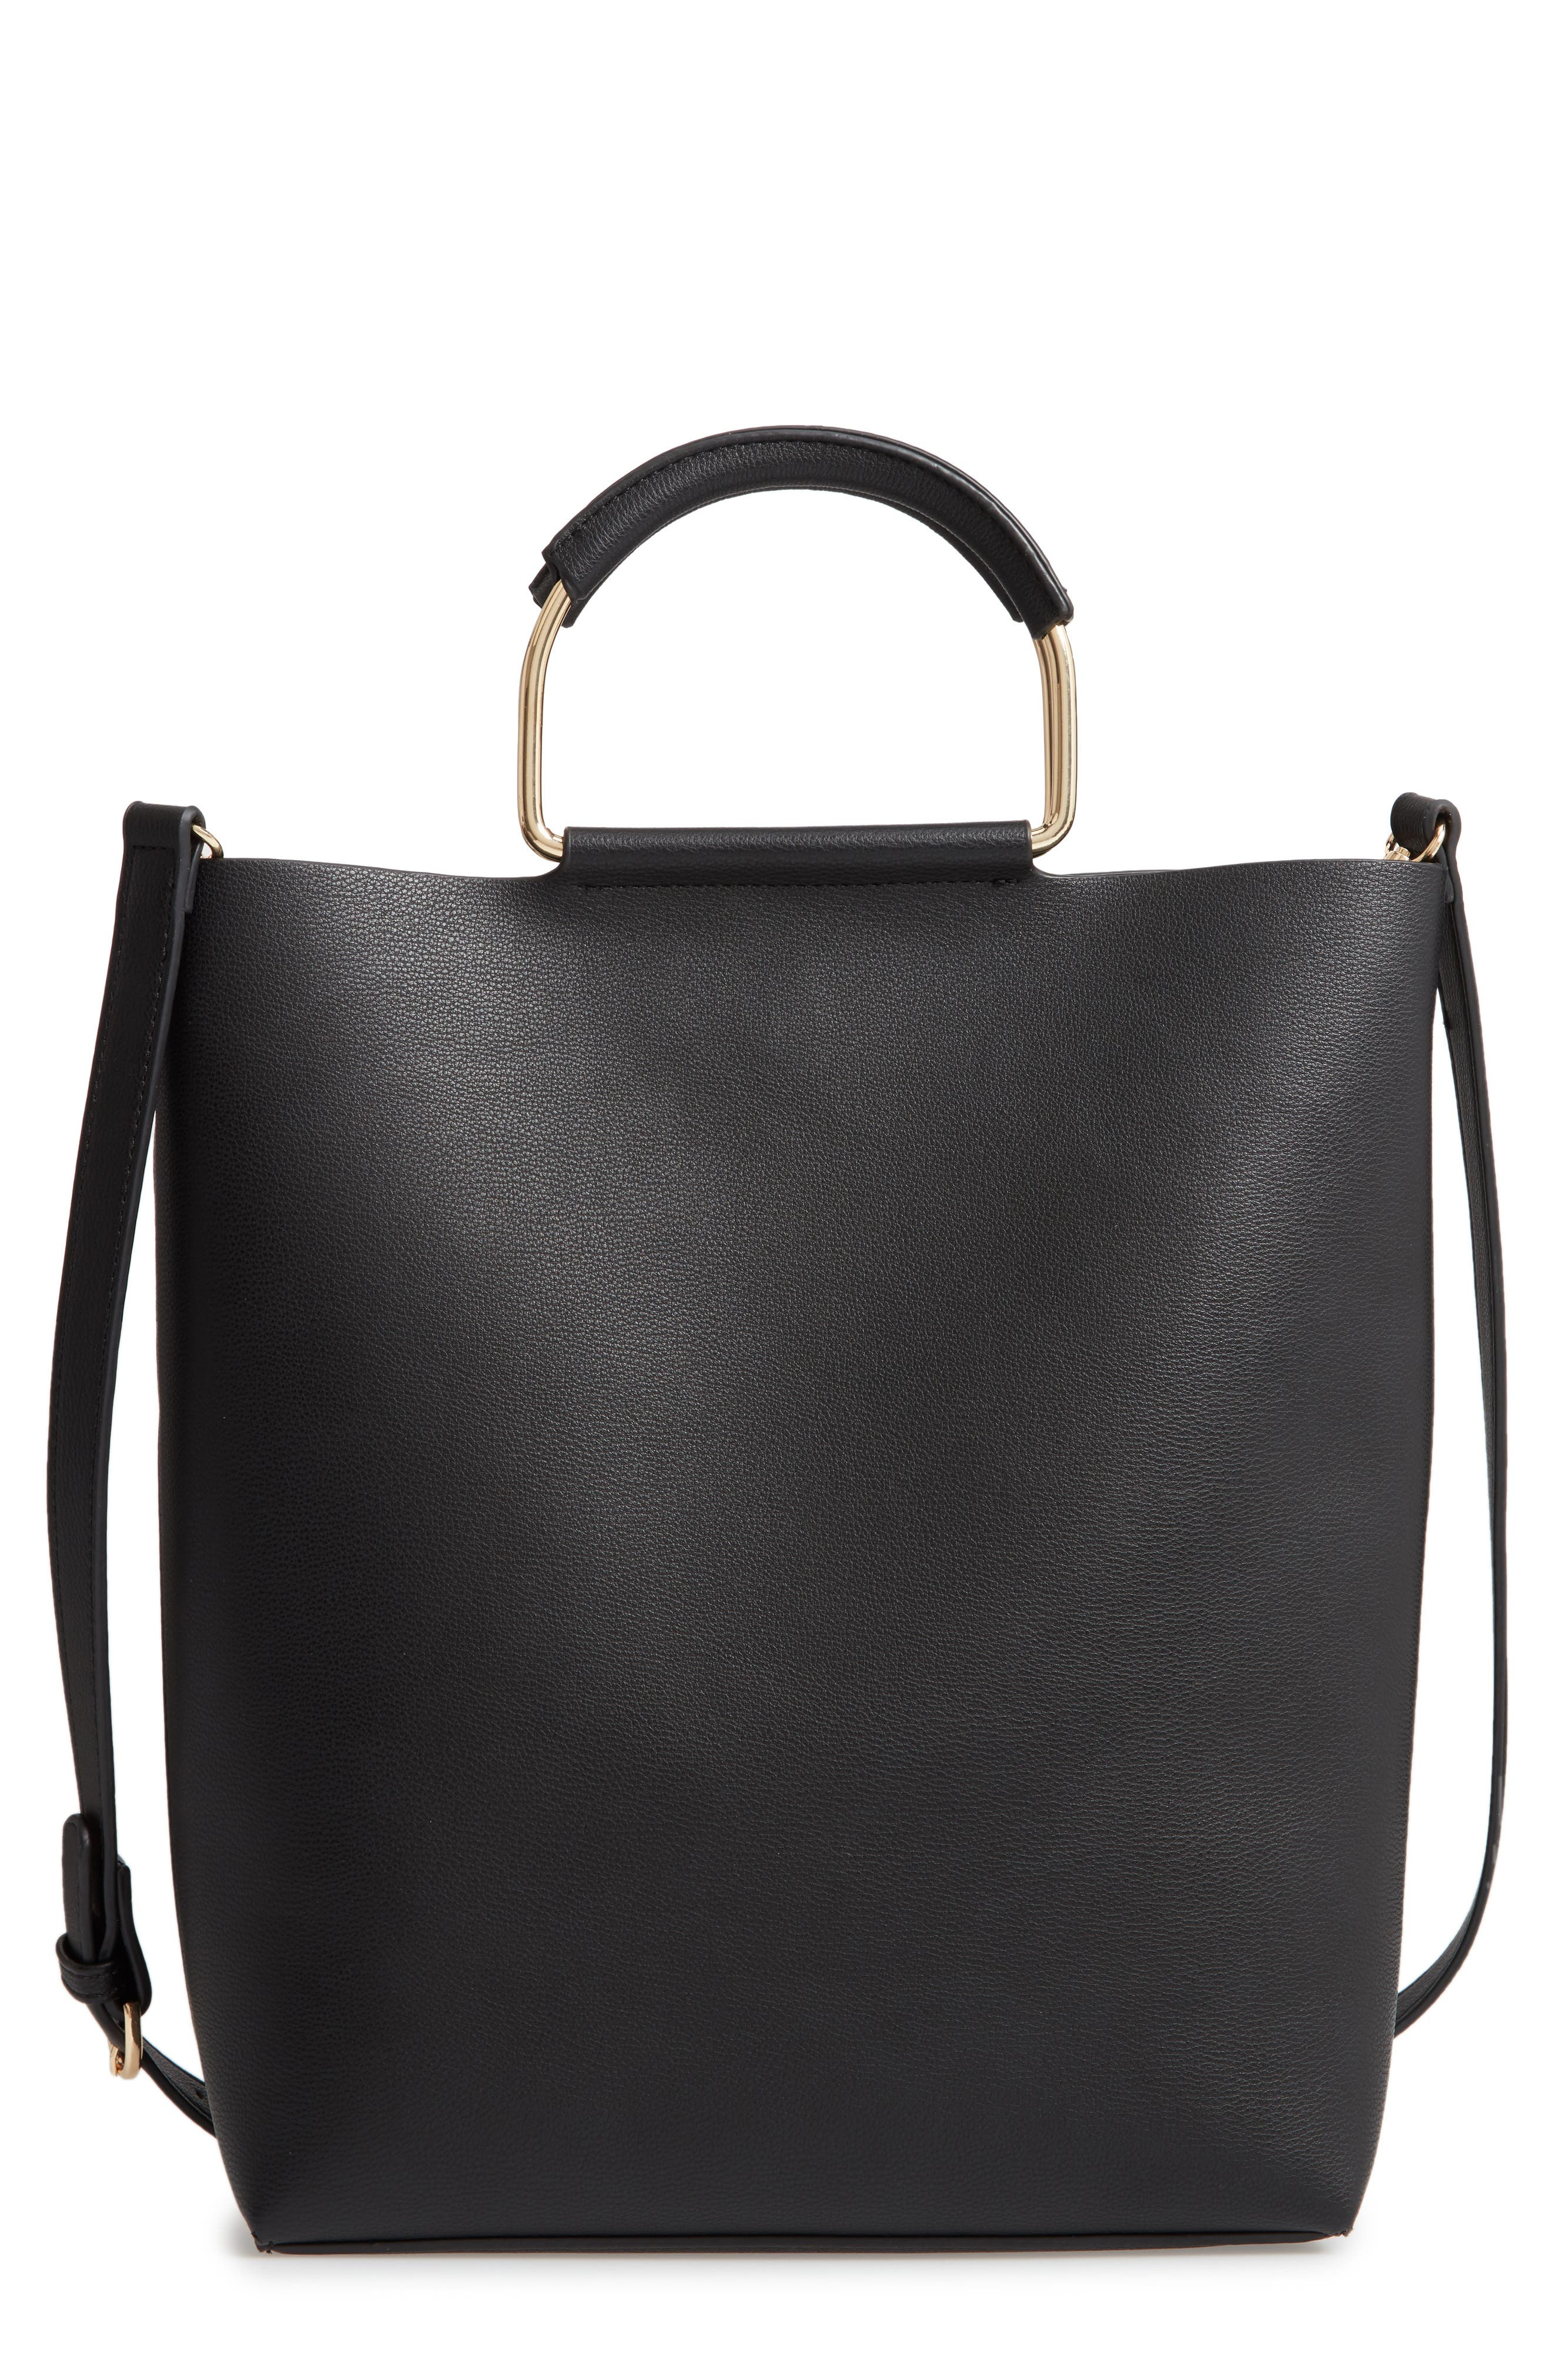 CHELSEA28, Payton Convertible Faux Leather Tote, Main thumbnail 1, color, BLACK